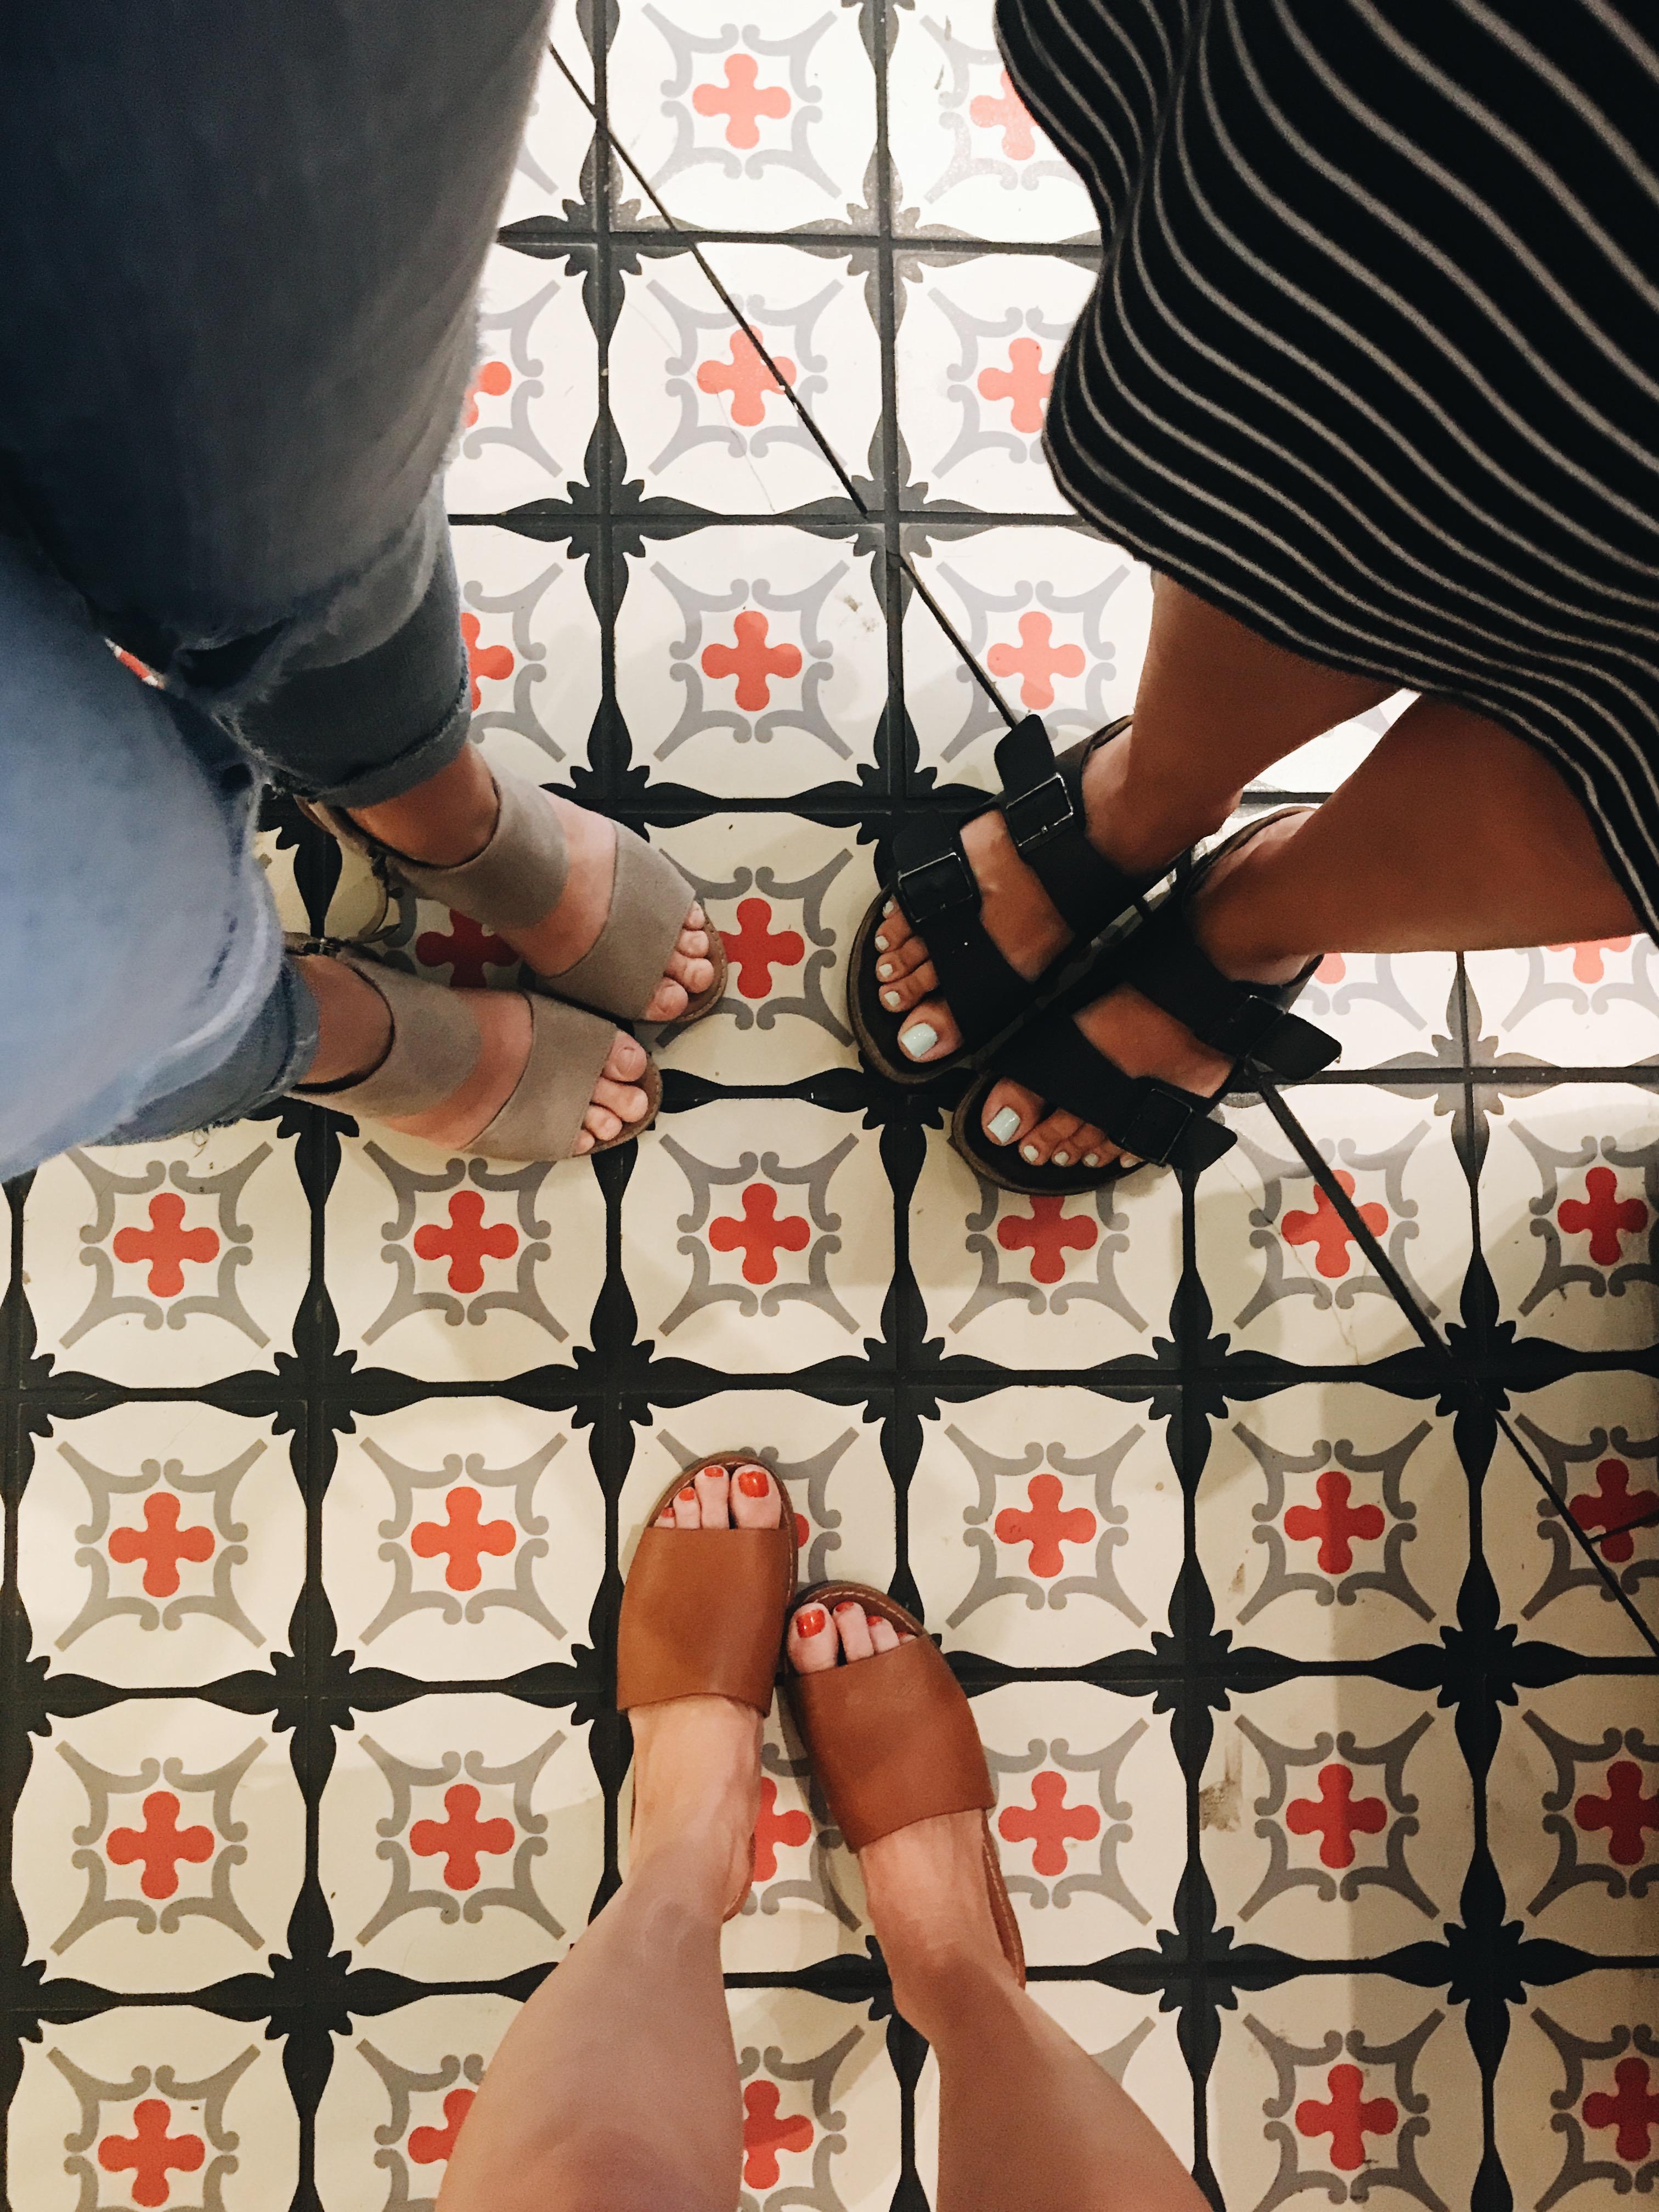 summer feet on tile